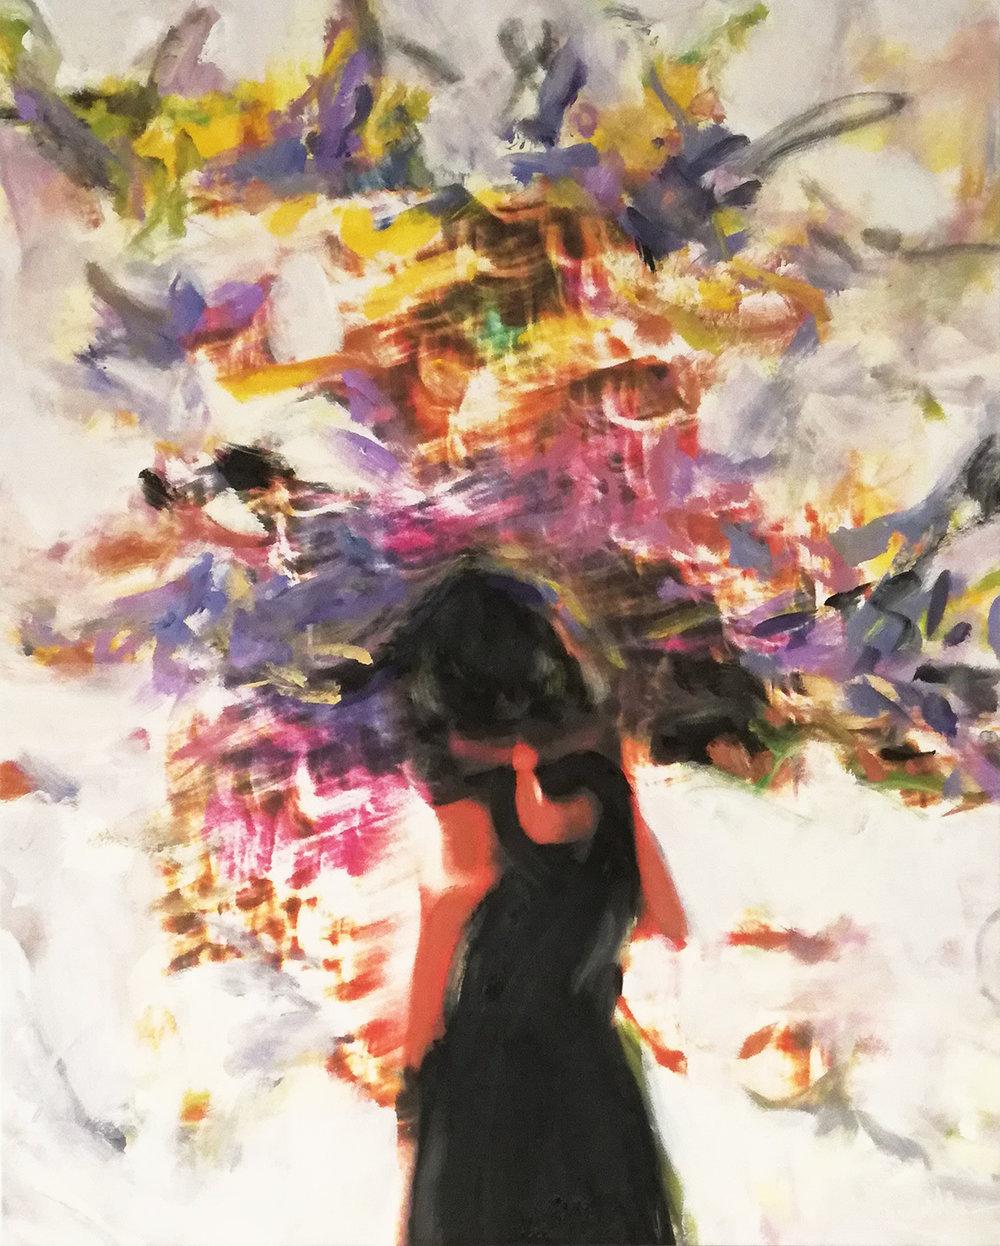 Andrew Hart Adler  'Ode to Joan Mitchell I'  Mixed media on digital print  97 x 77 cm